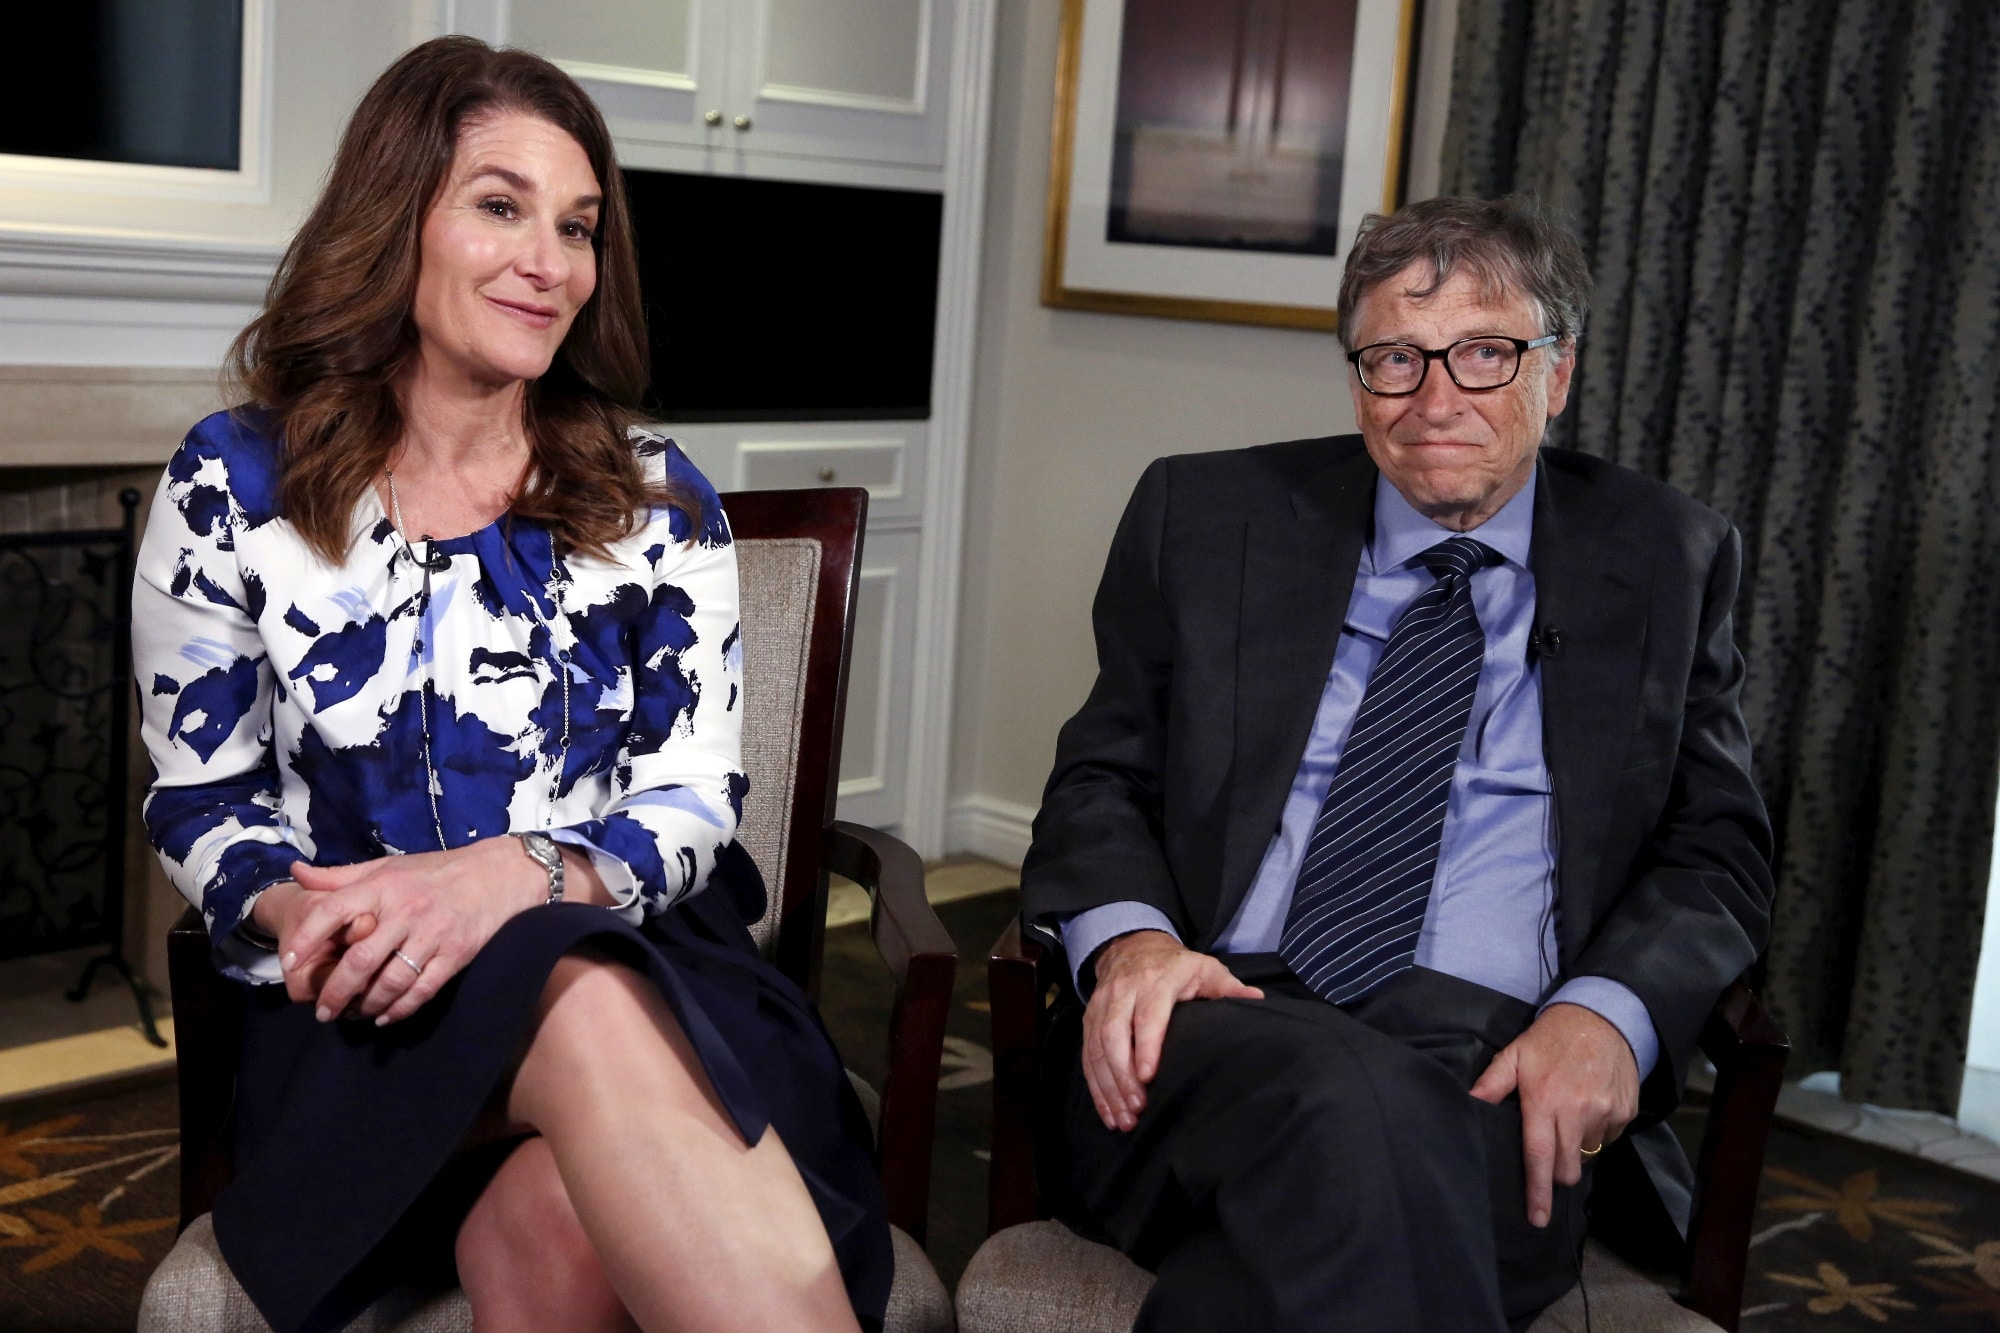 Spoluzakladatel Microsoftu Bill Gates s manželkou Melindou během interview v New Yorku, 2016